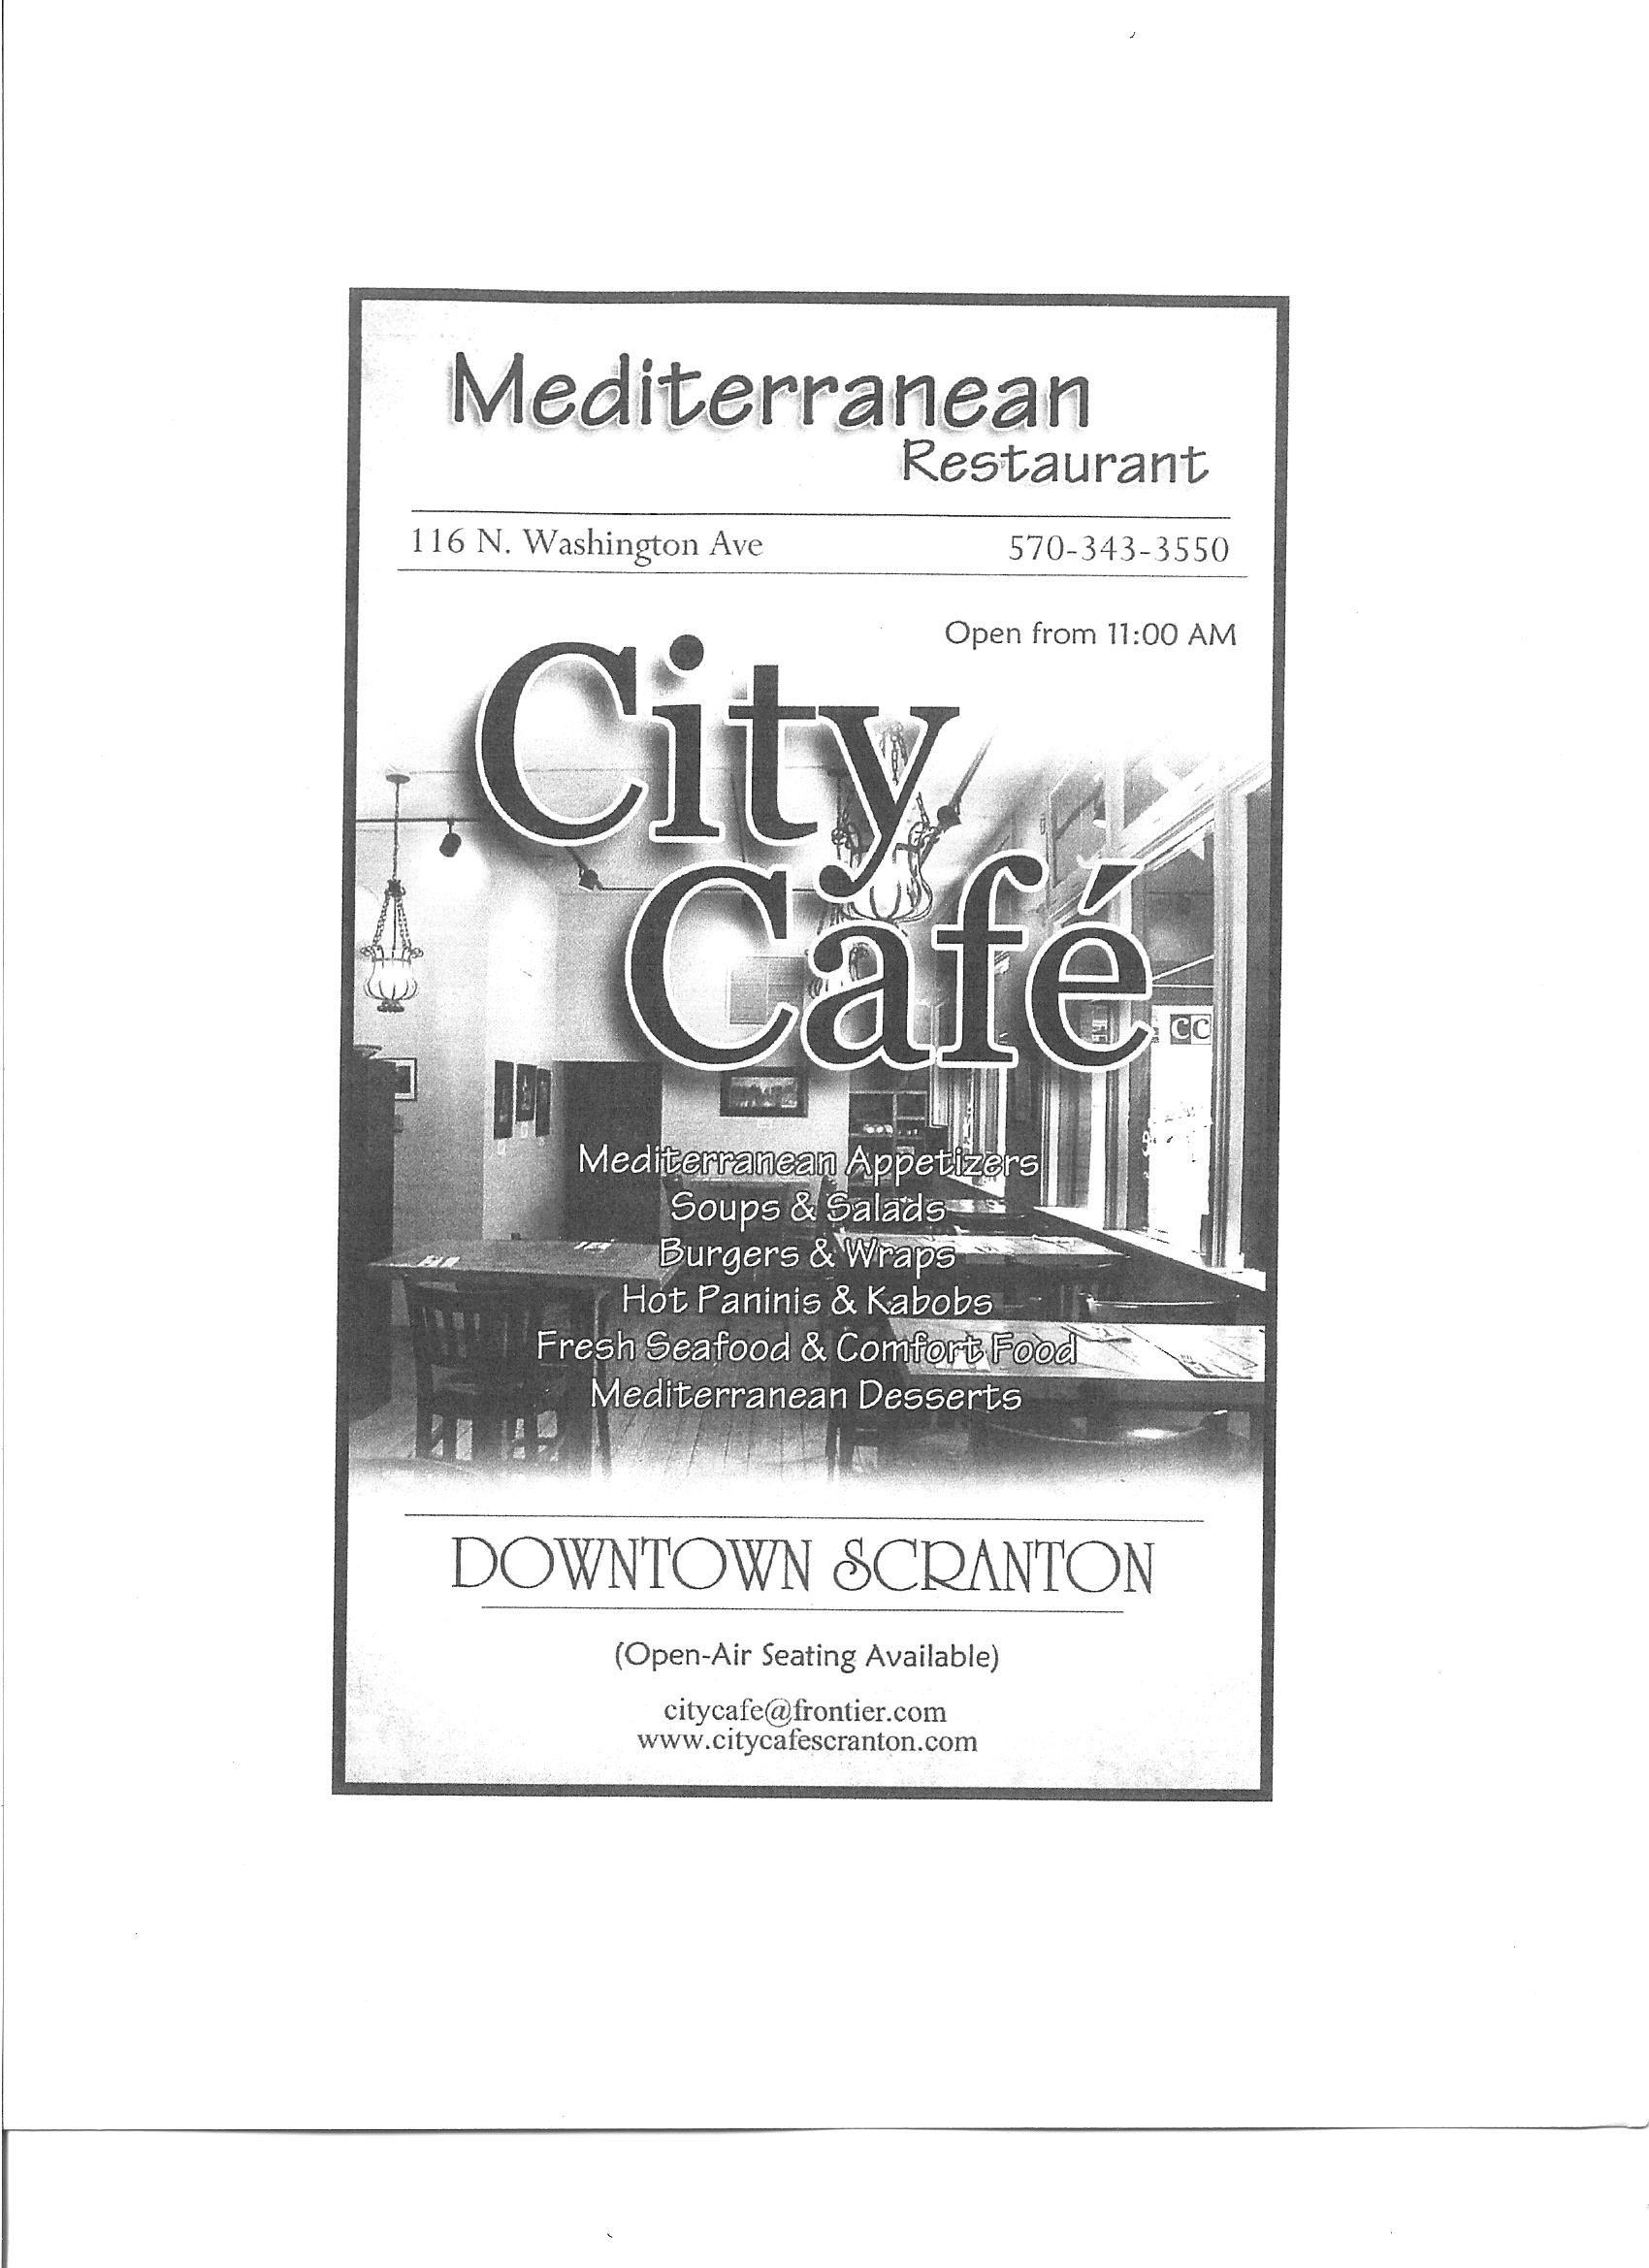 City cafe 116 n washington ave scranton pa httpwww